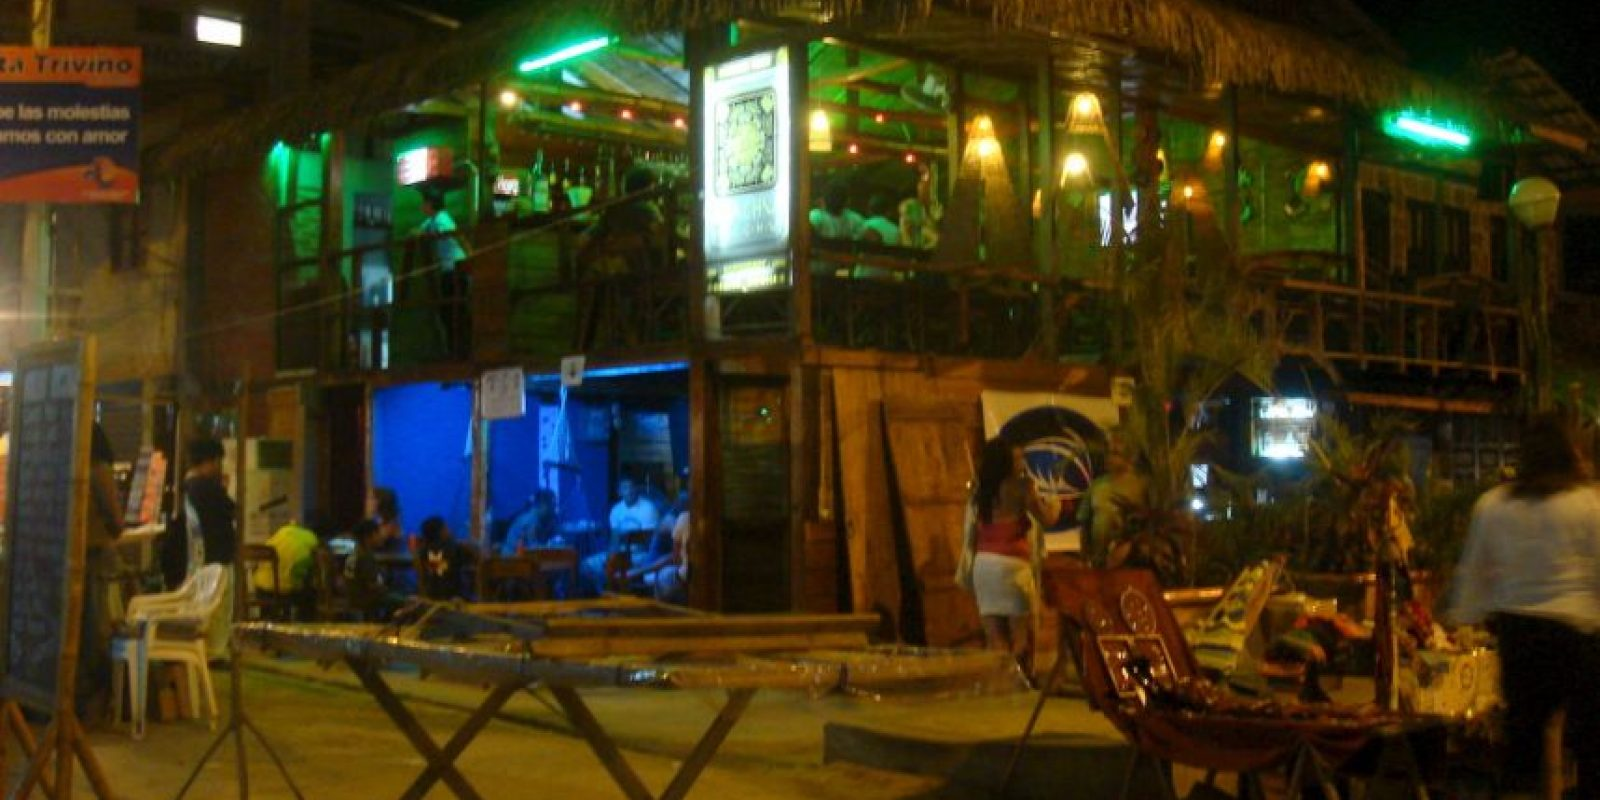 Se encuentra a solamente 200 Km de la ciudad de Guayaquil. Foto:Flickr.com